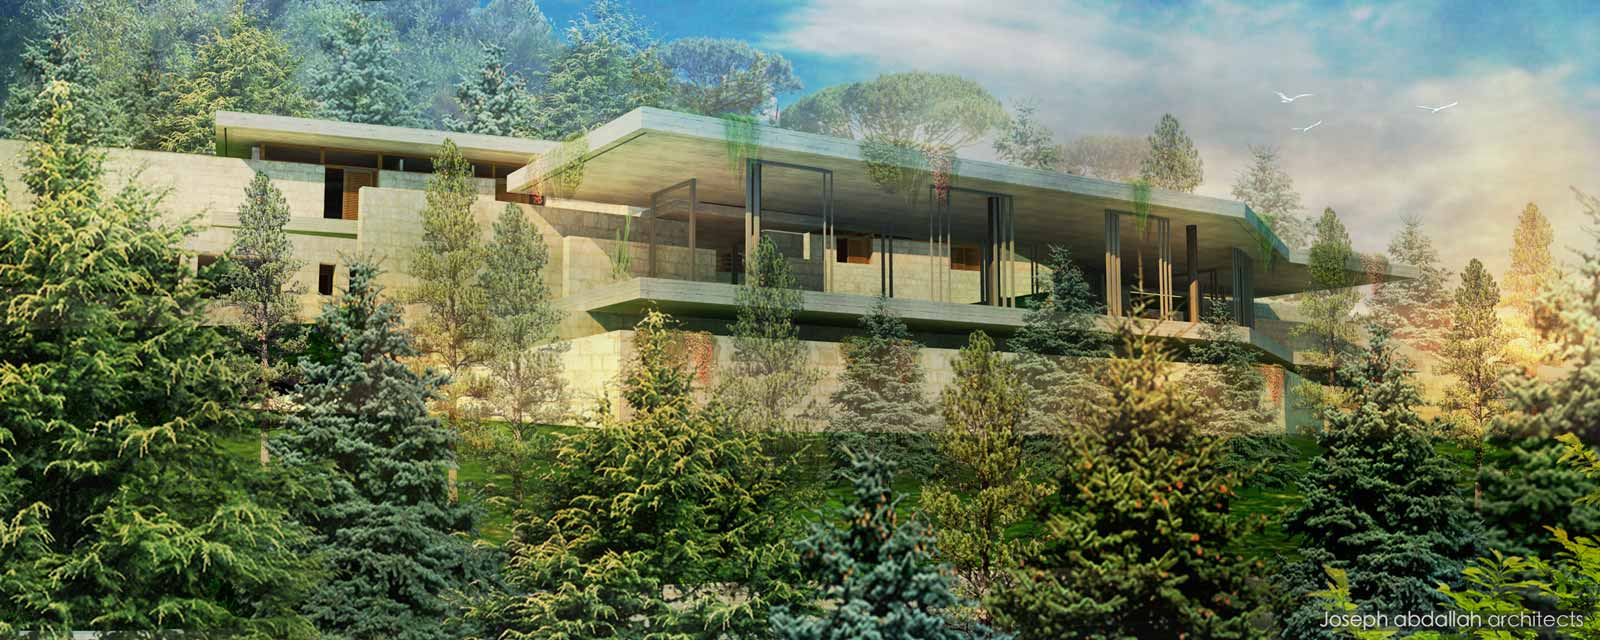 bakhos-nassif-eagle-nest-villa-lebanon-joseph-abdallah-architects-4